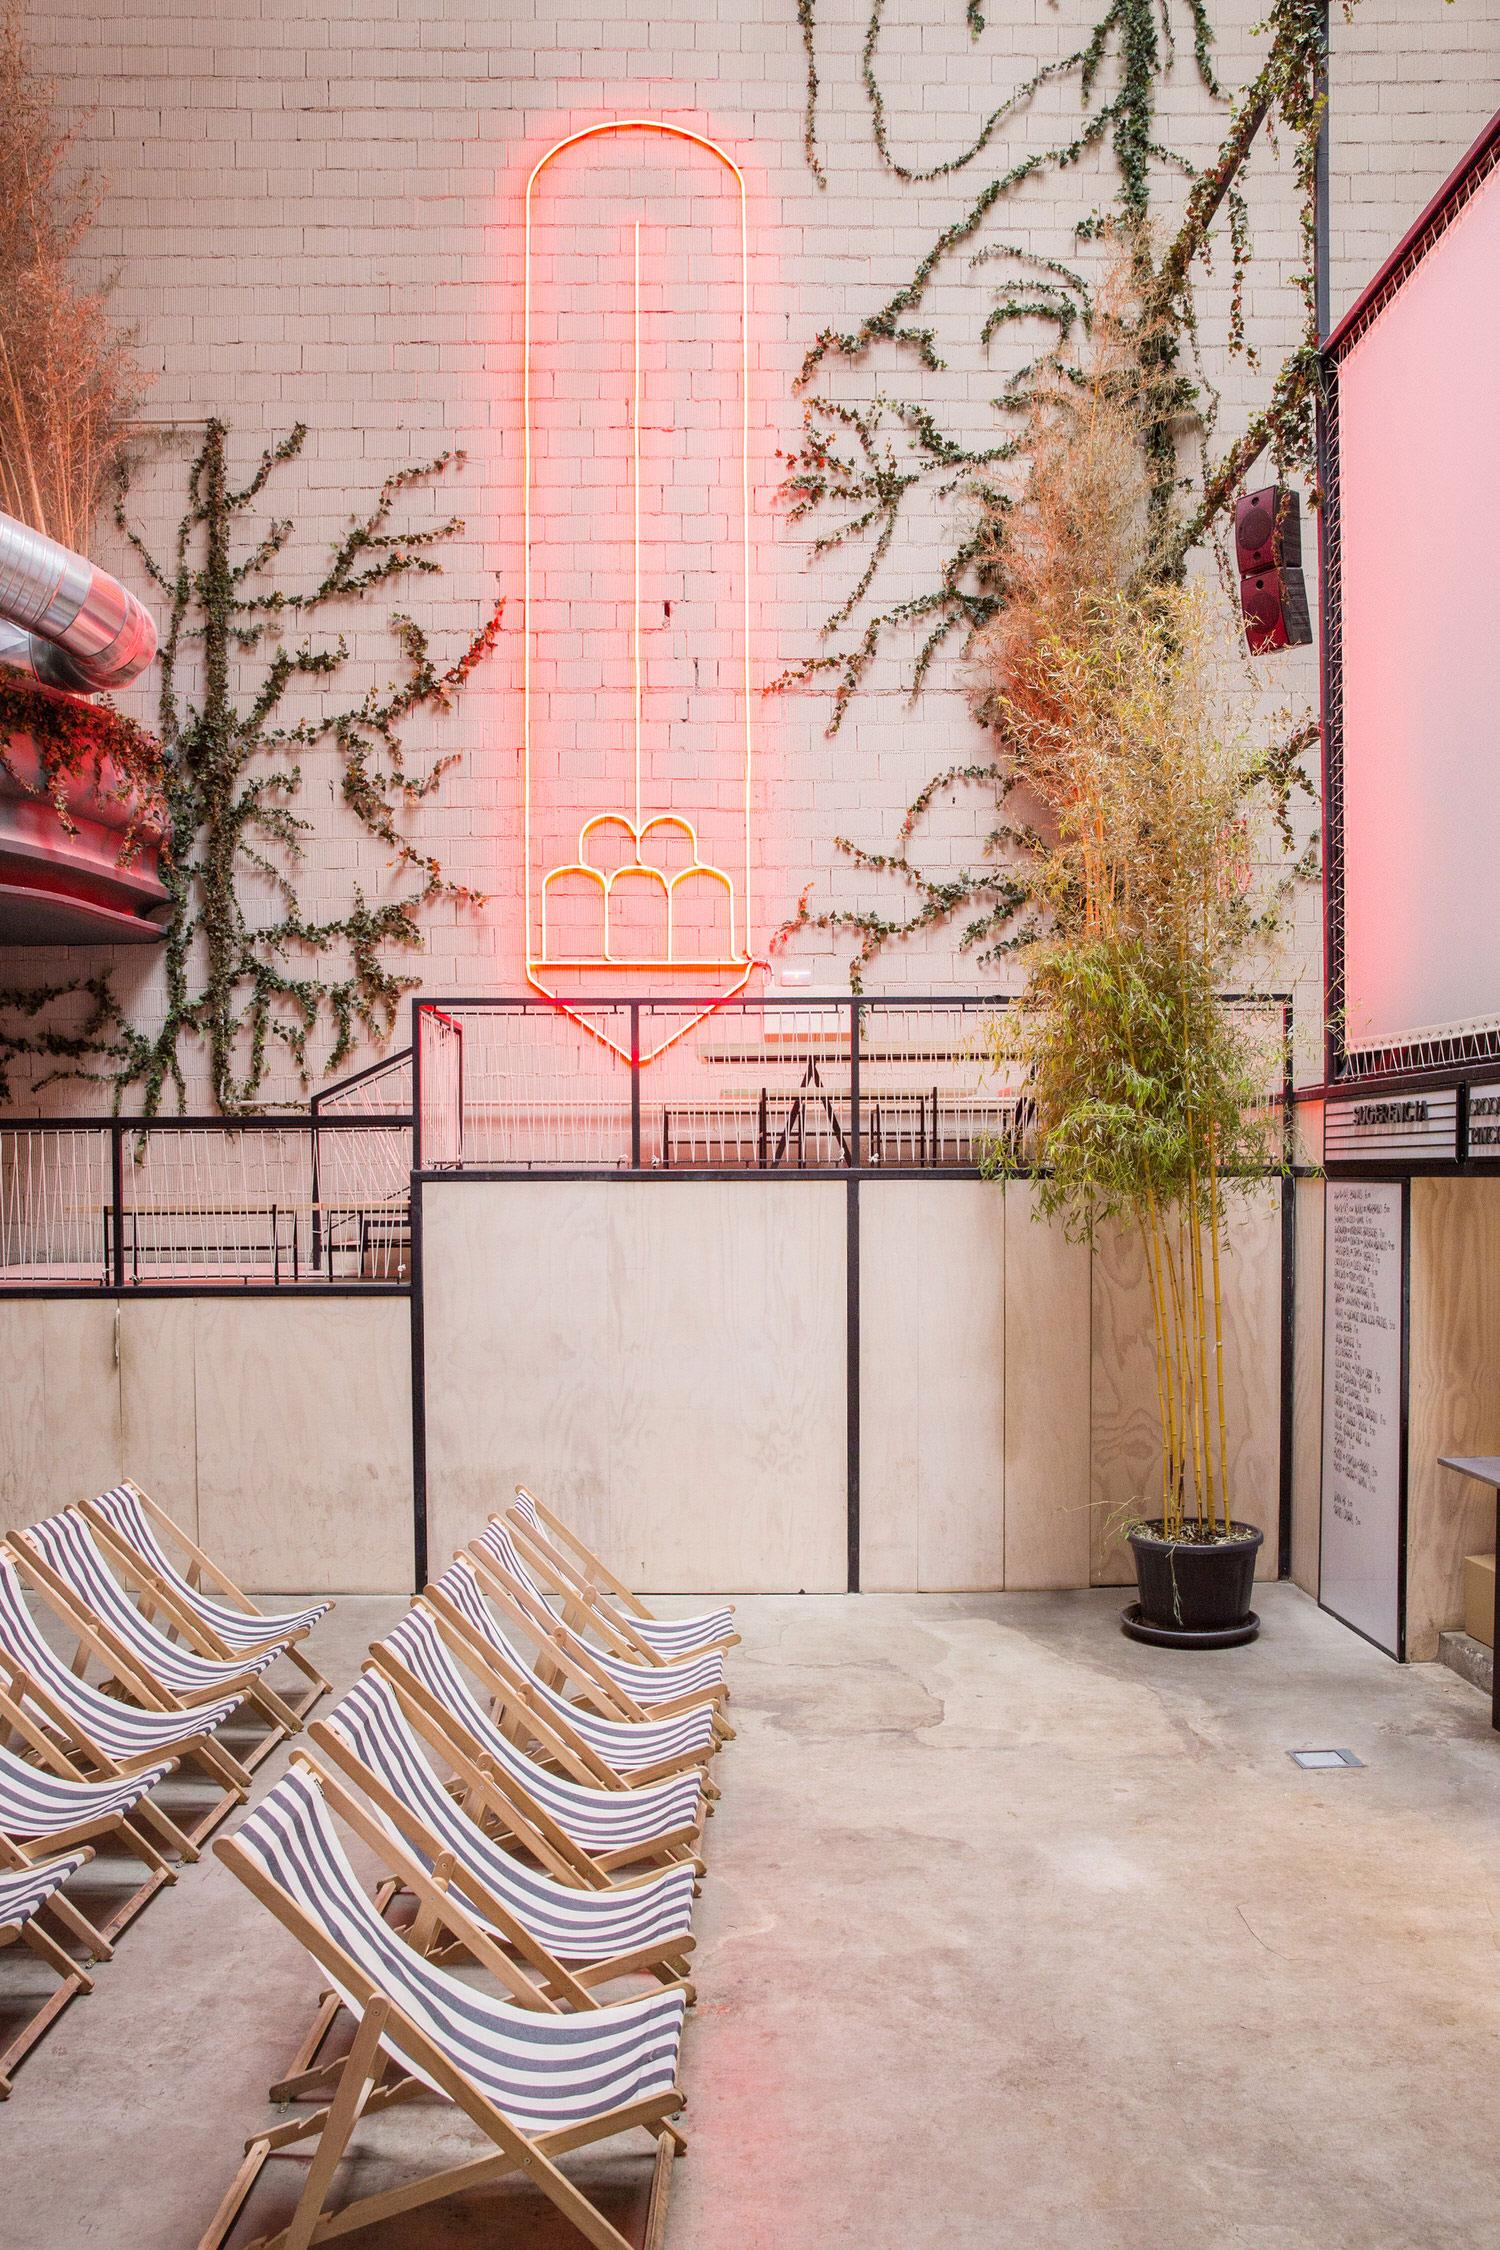 Sala Equis, Madrid Cinema Interiors, Plantea Estudio, Photo Alicia Macias | Yellowtrace